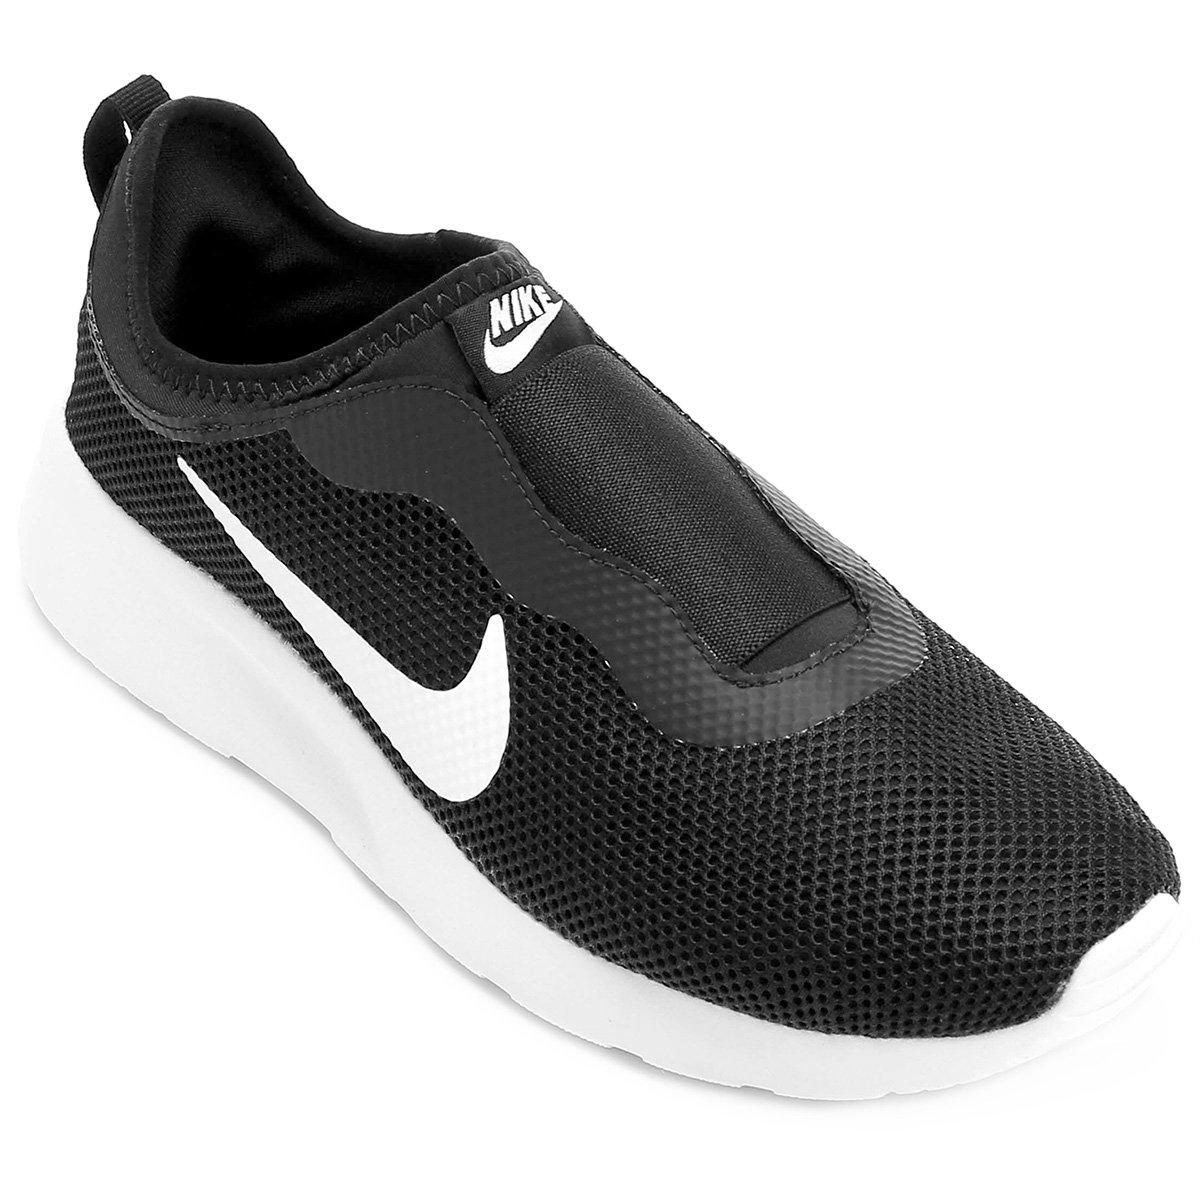 f4d255f98eb Tênis Nike Wmns Tanjun Slip Feminino - Compre Agora